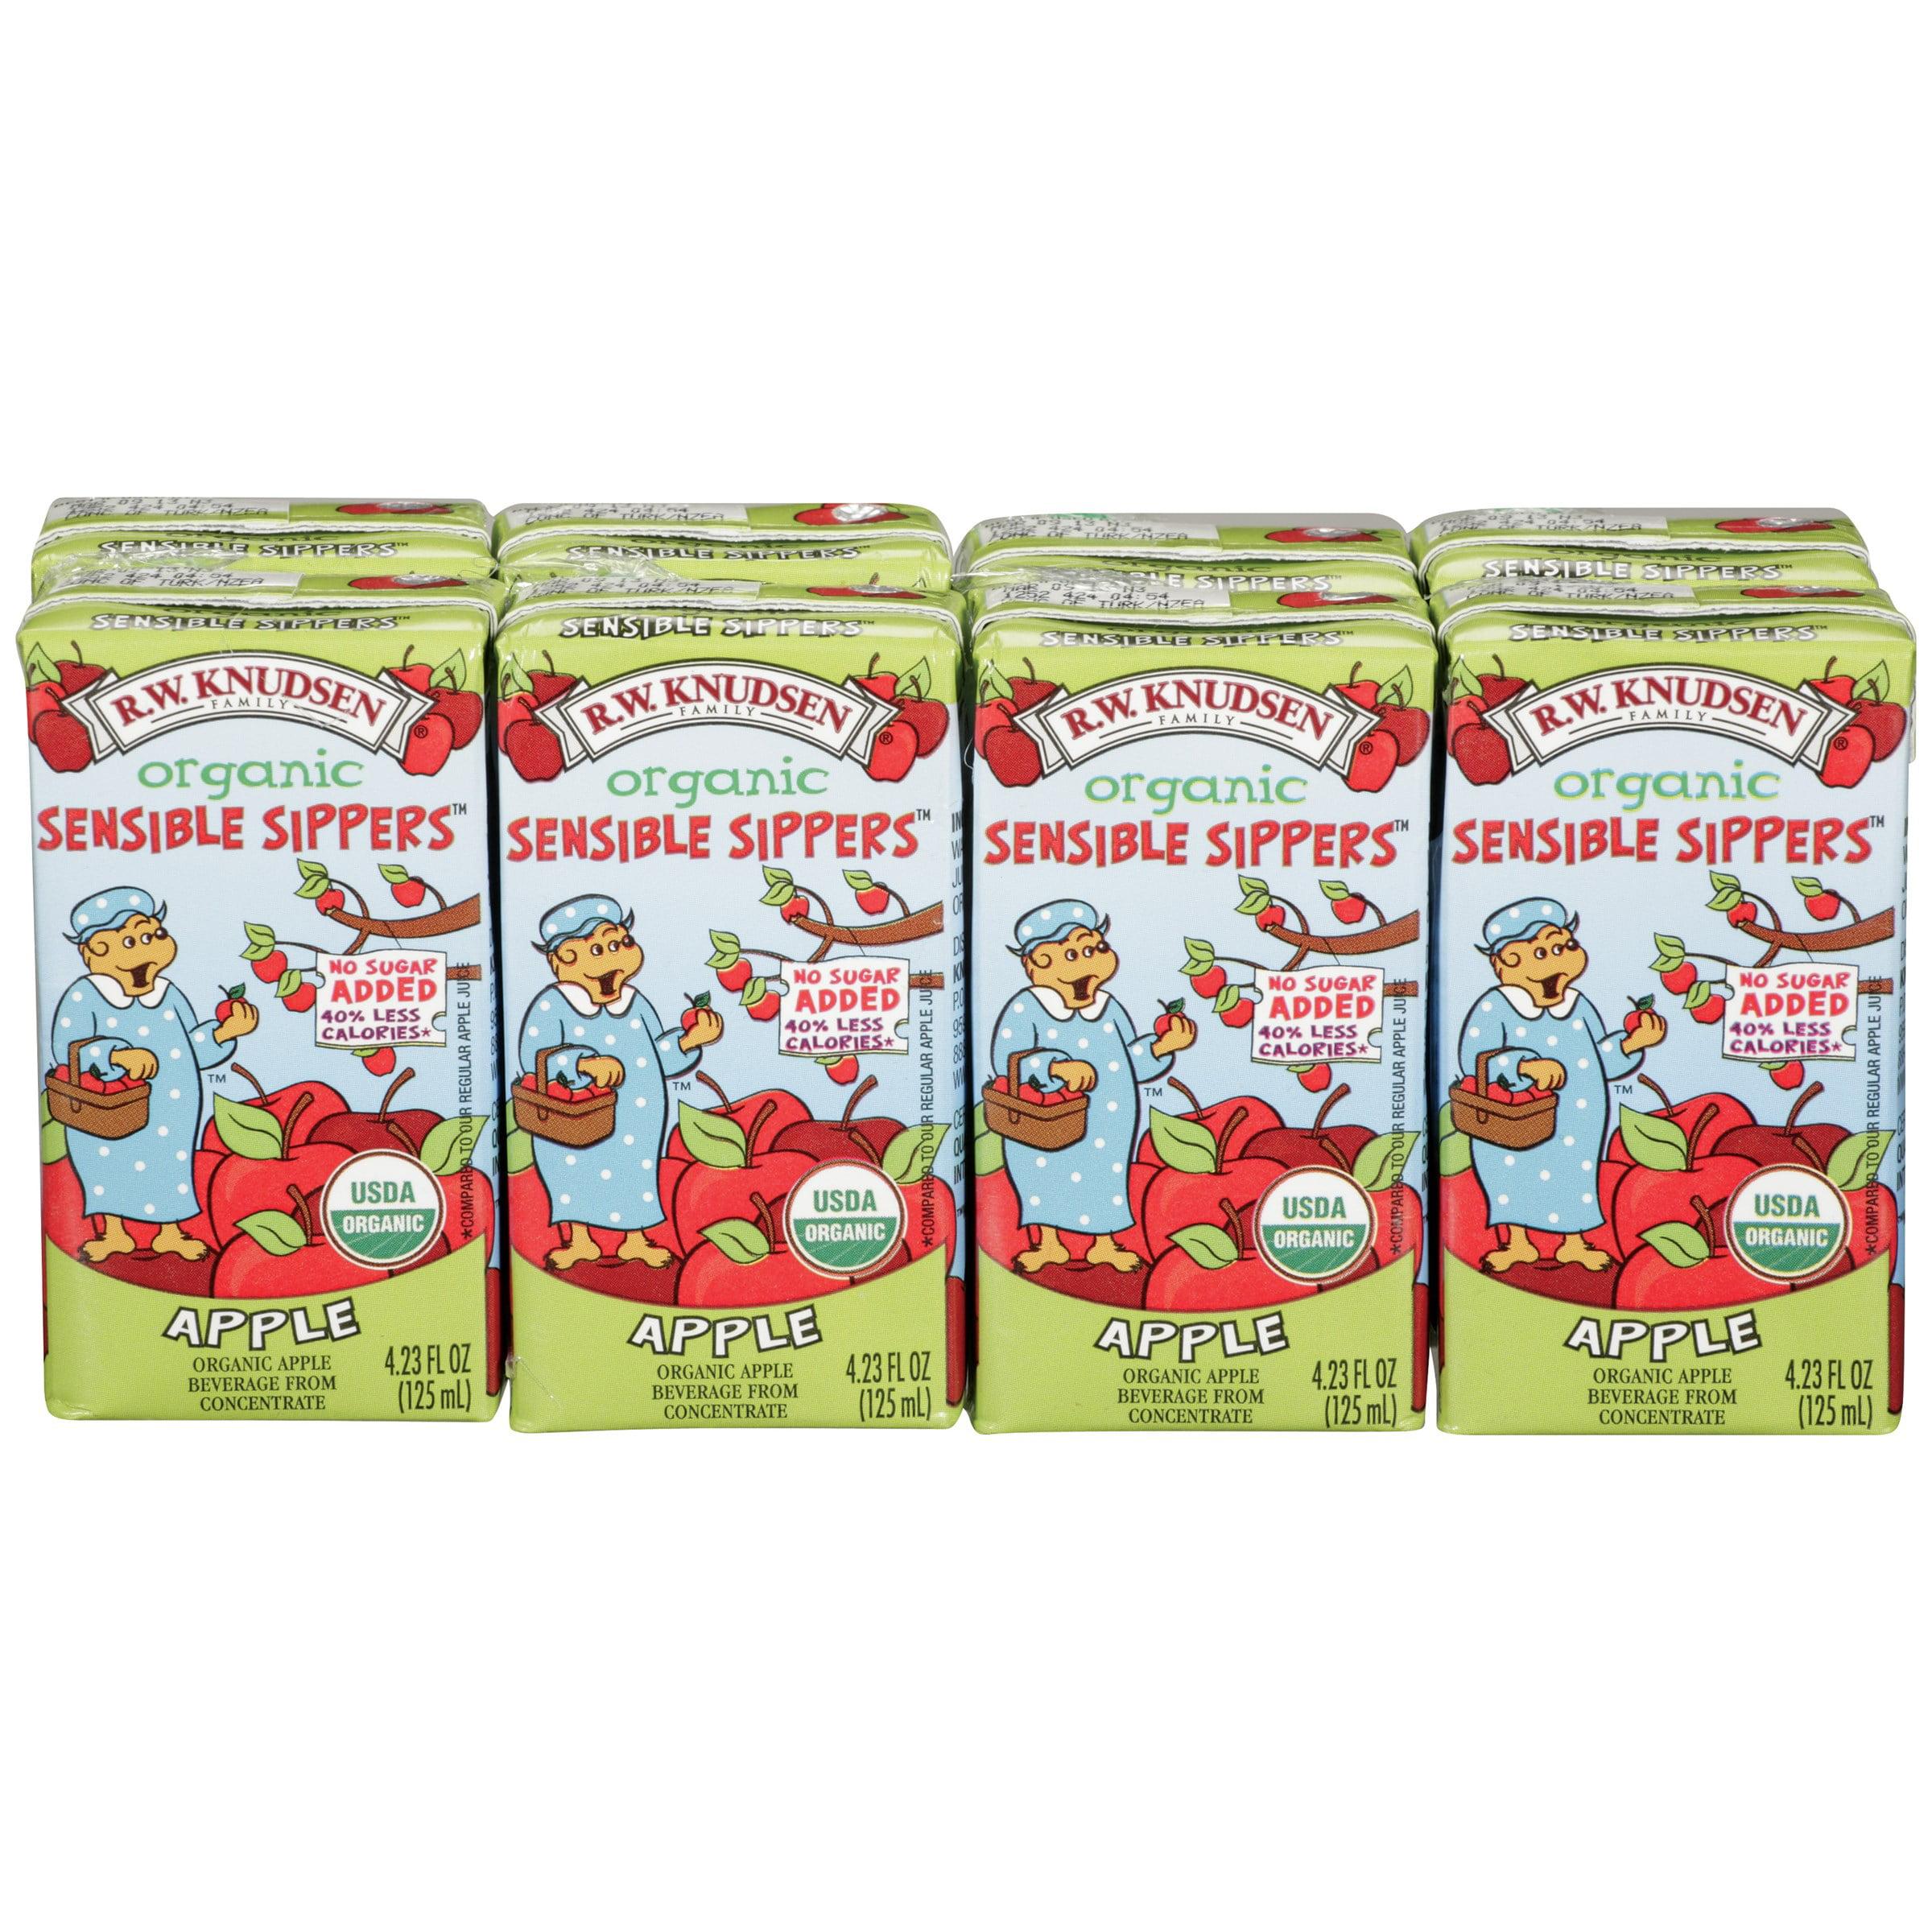 R.w. Knudsen Sensible Sippers Organic Apple Juice Box, 8 Ct (pack Of 5)